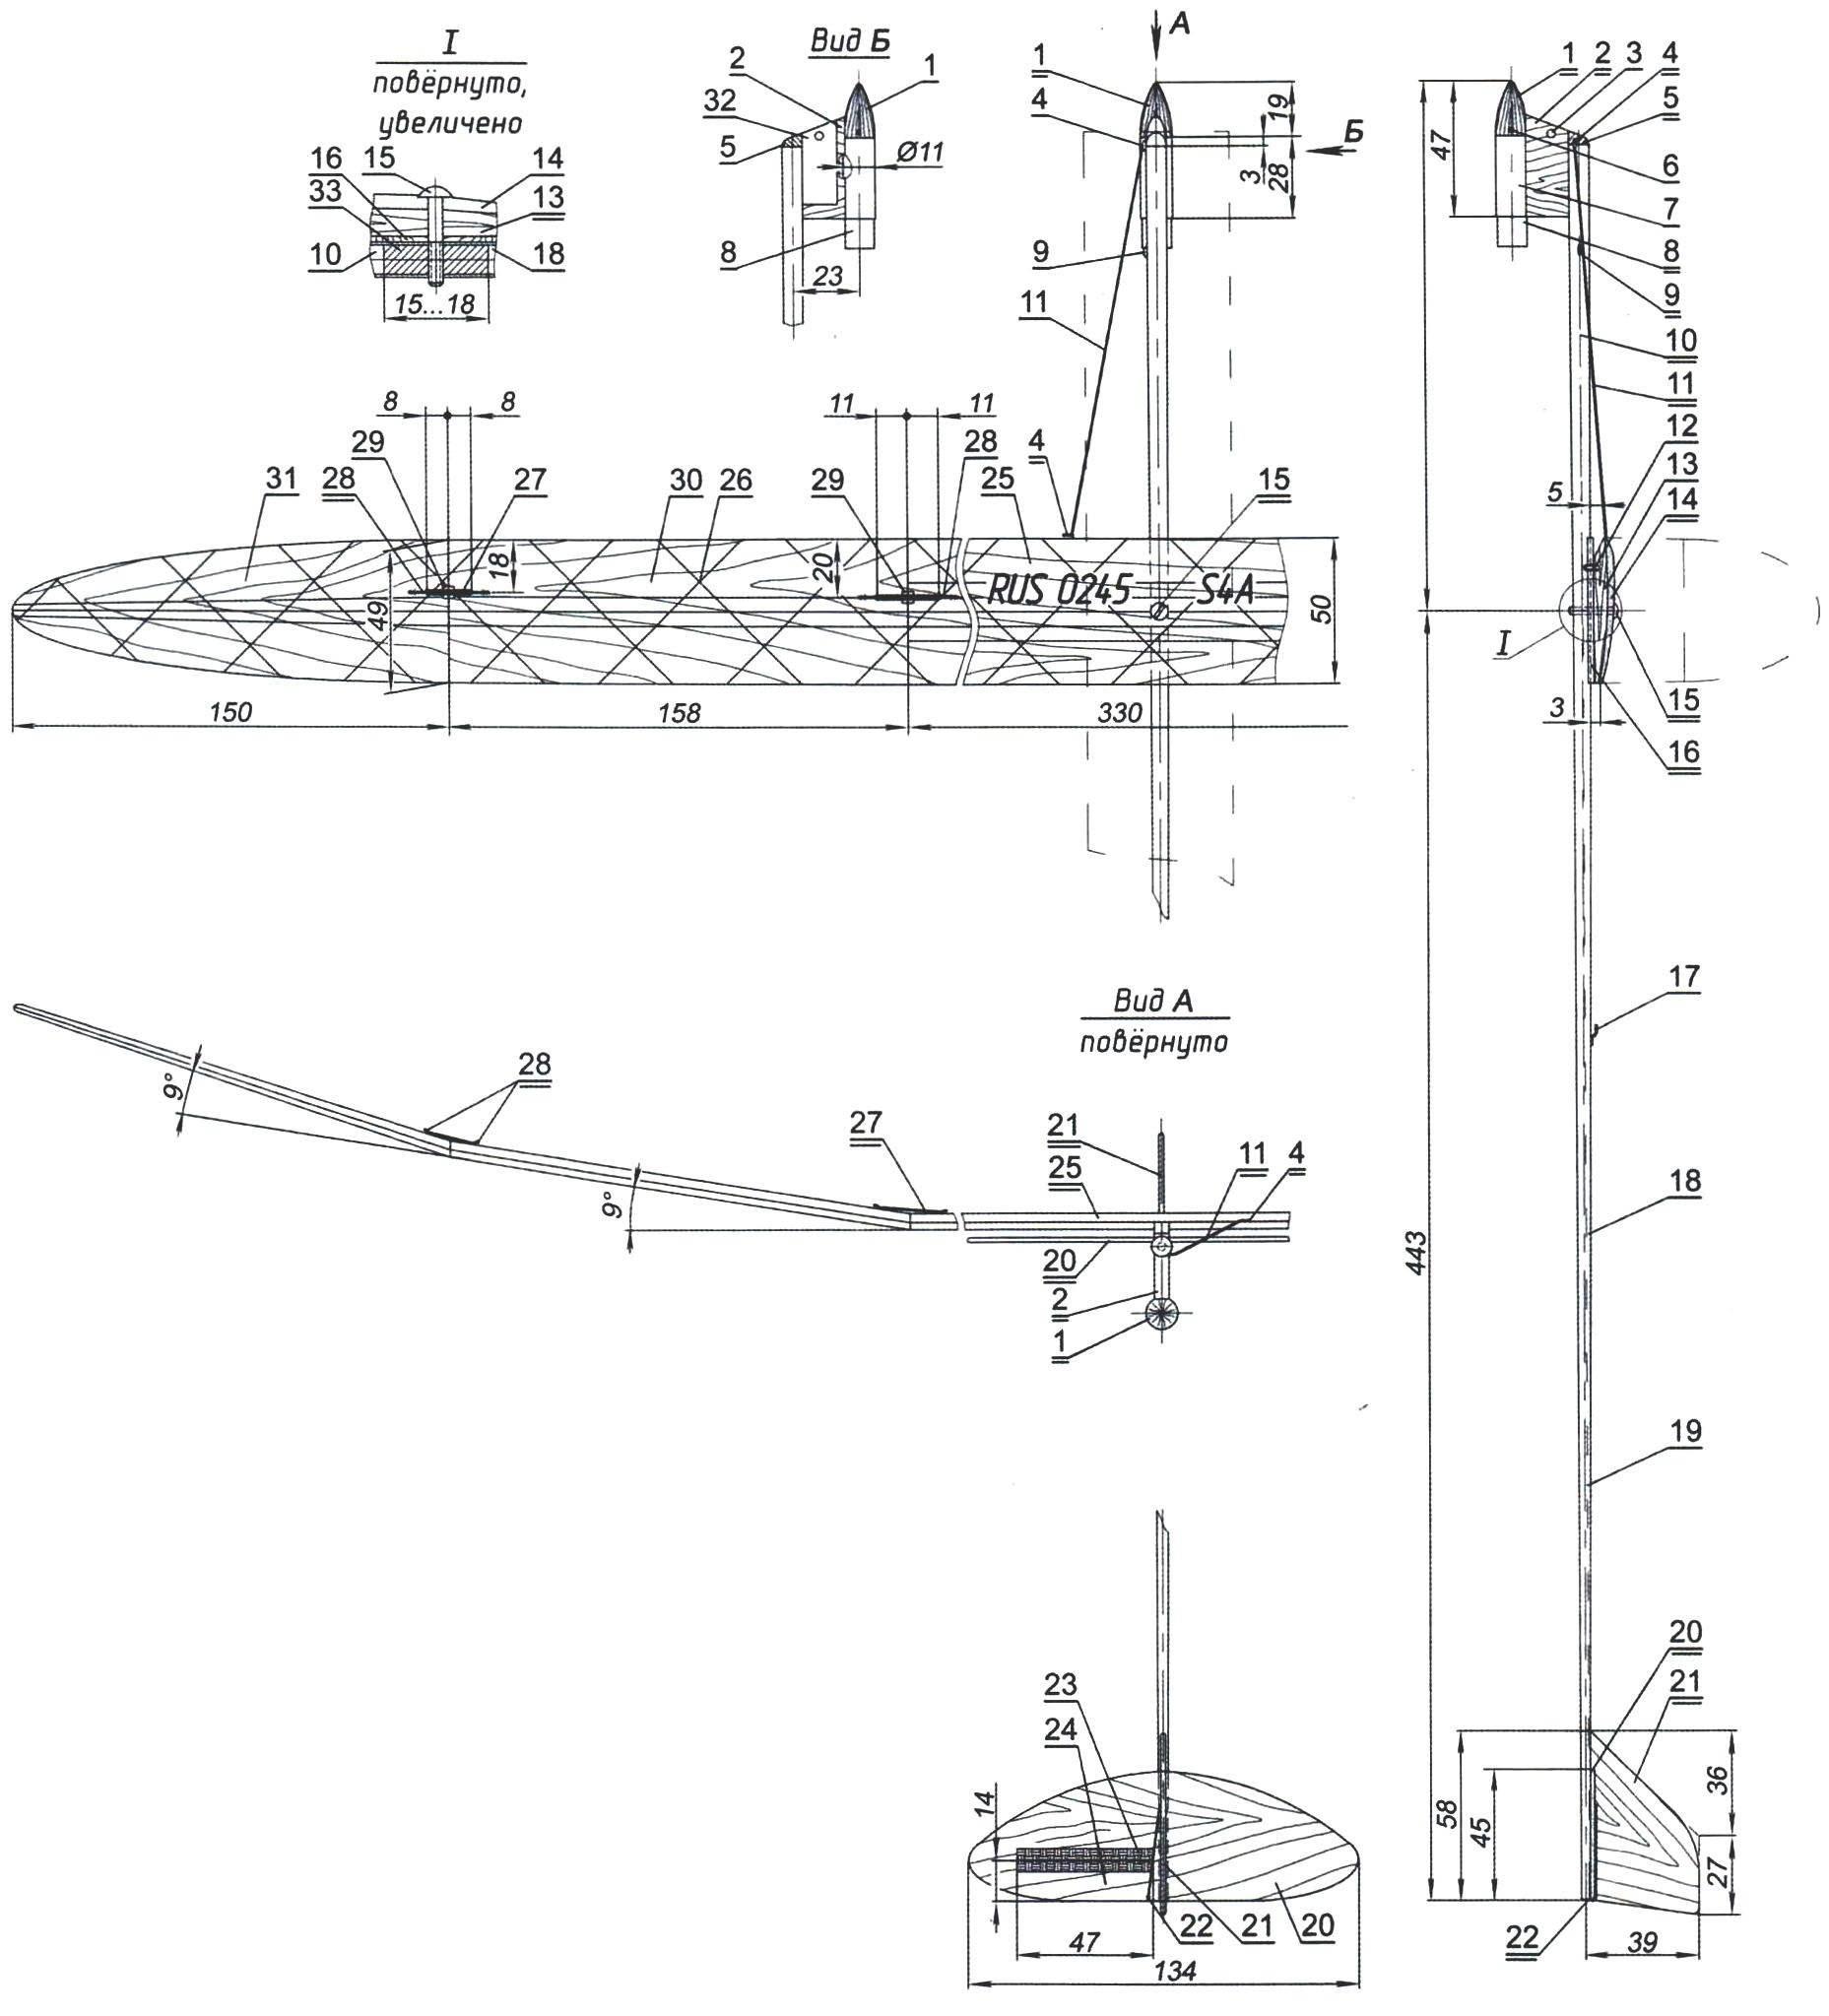 hight resolution of model rocket modeling class 4 champion of russia n tsygankov murmansk